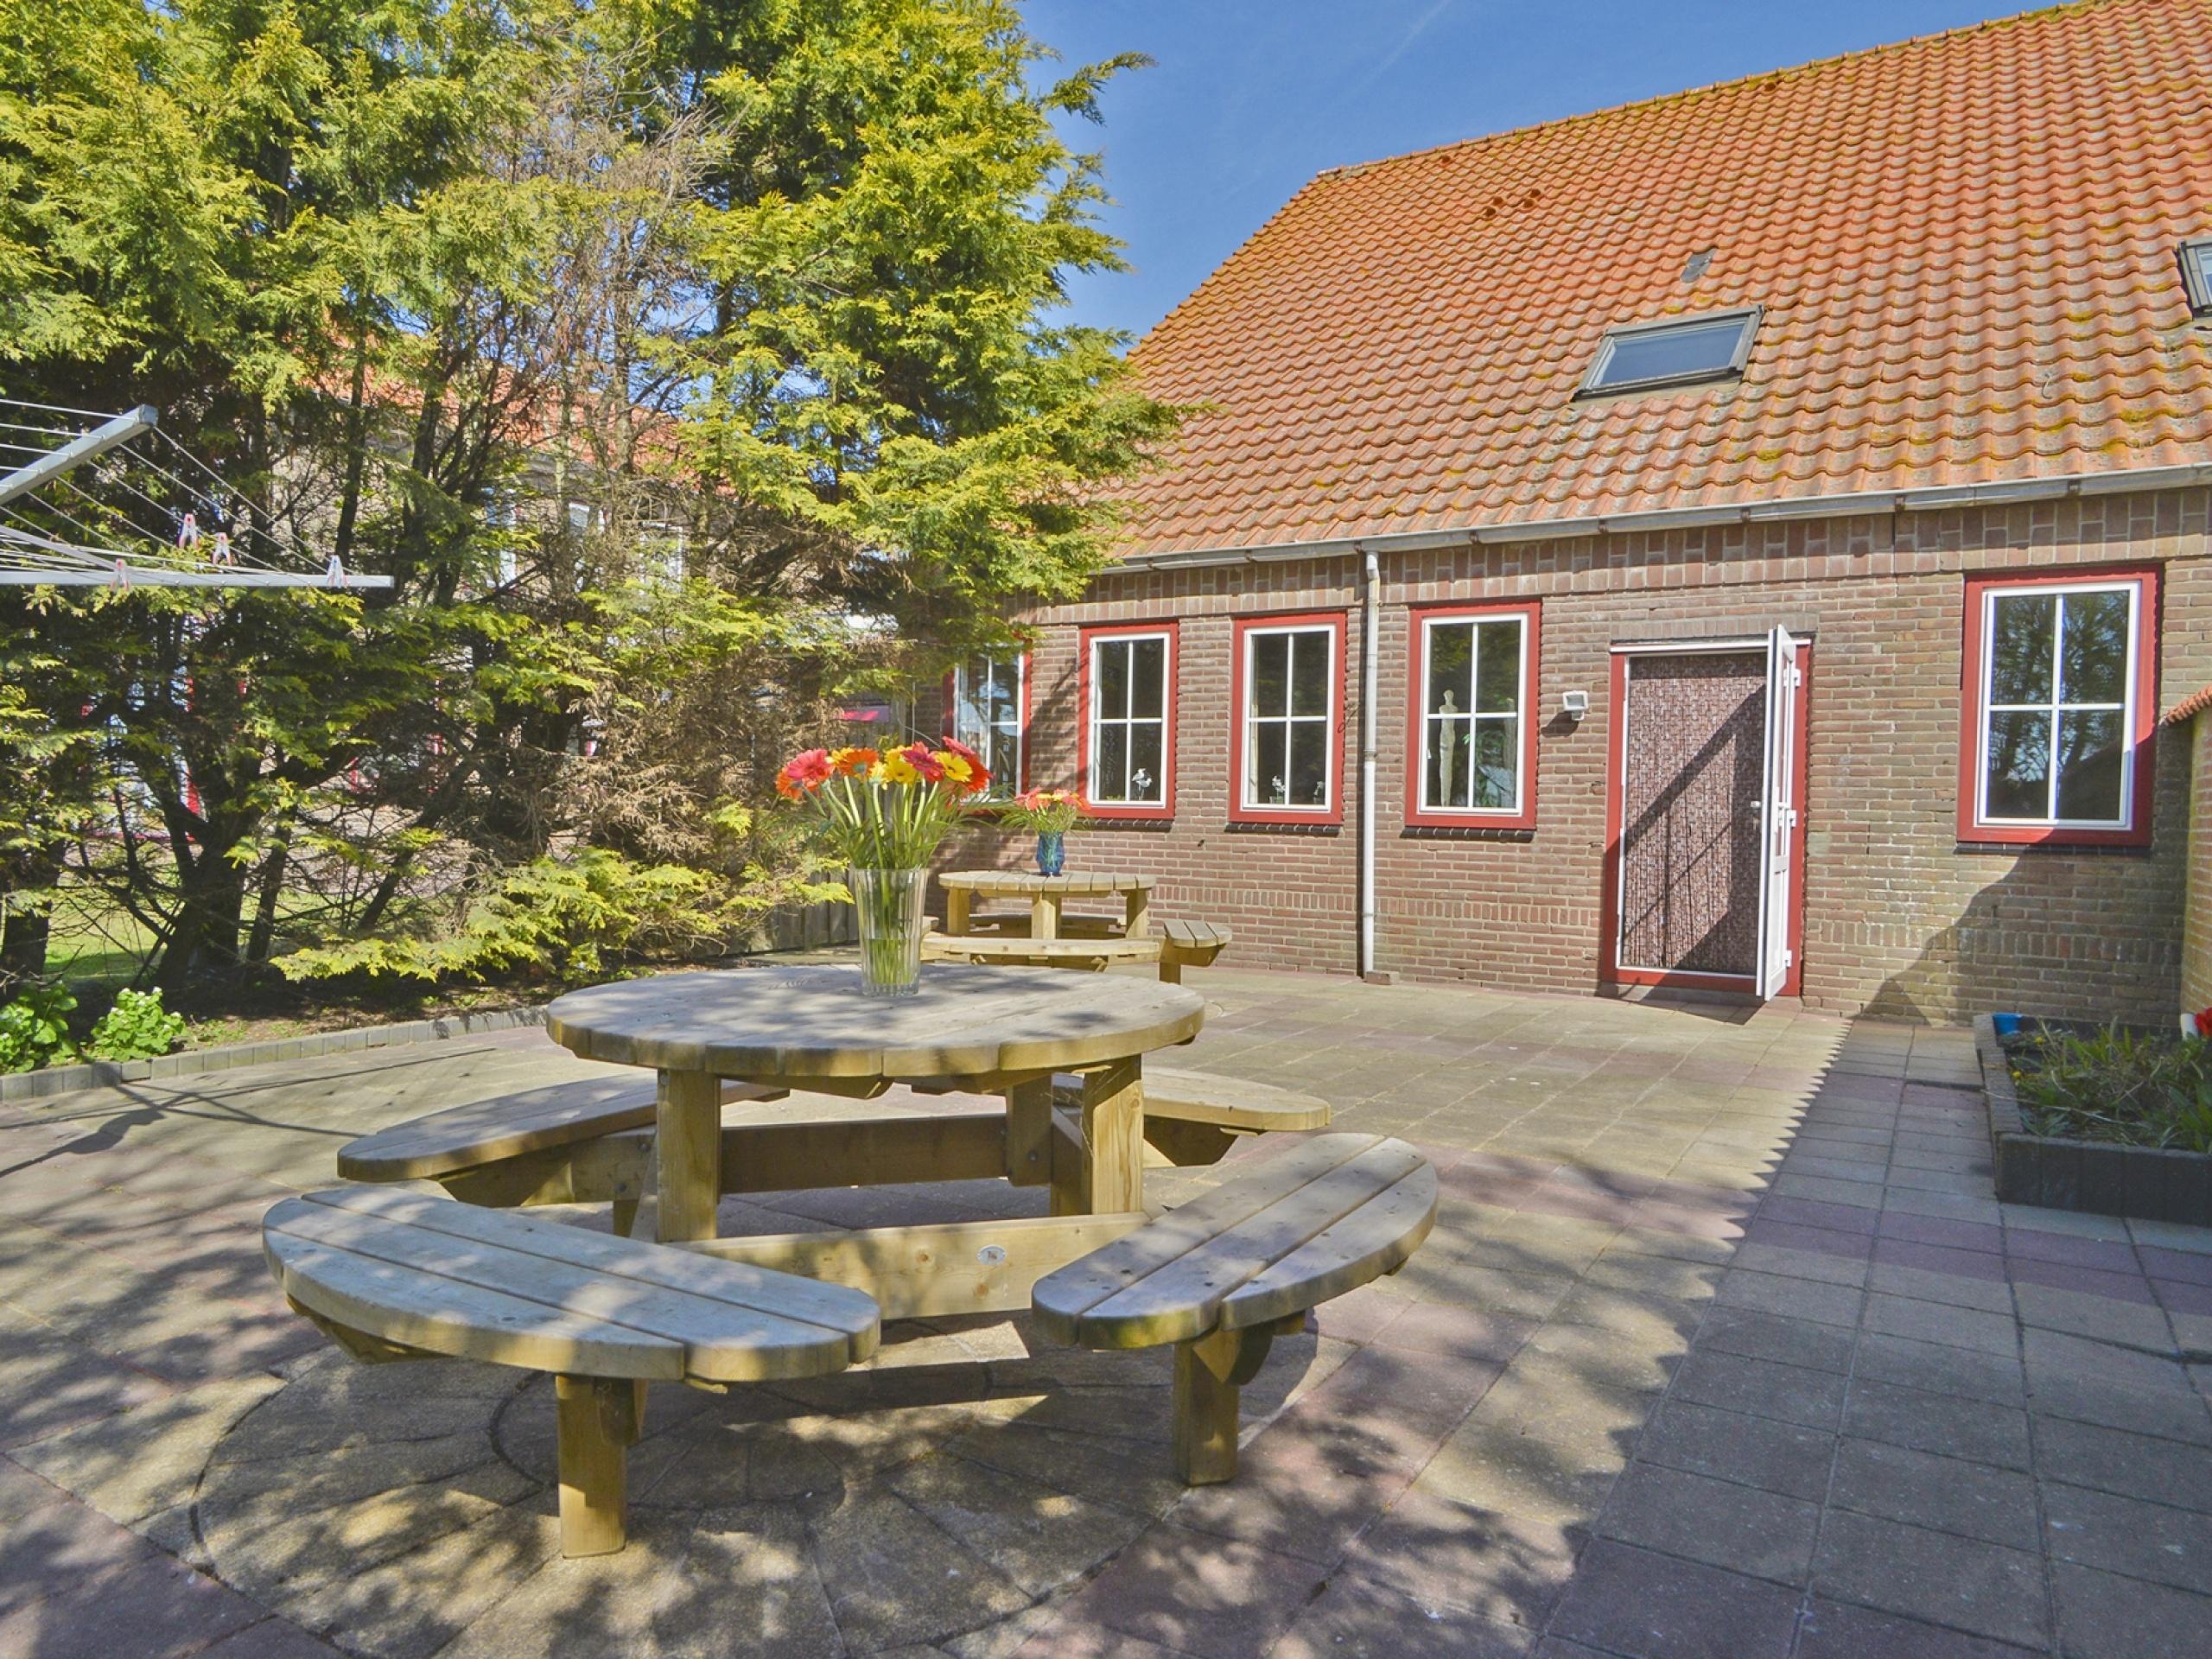 Ruim vakantiehuis op het erf van boerderij op unieke lokatie in Eierland